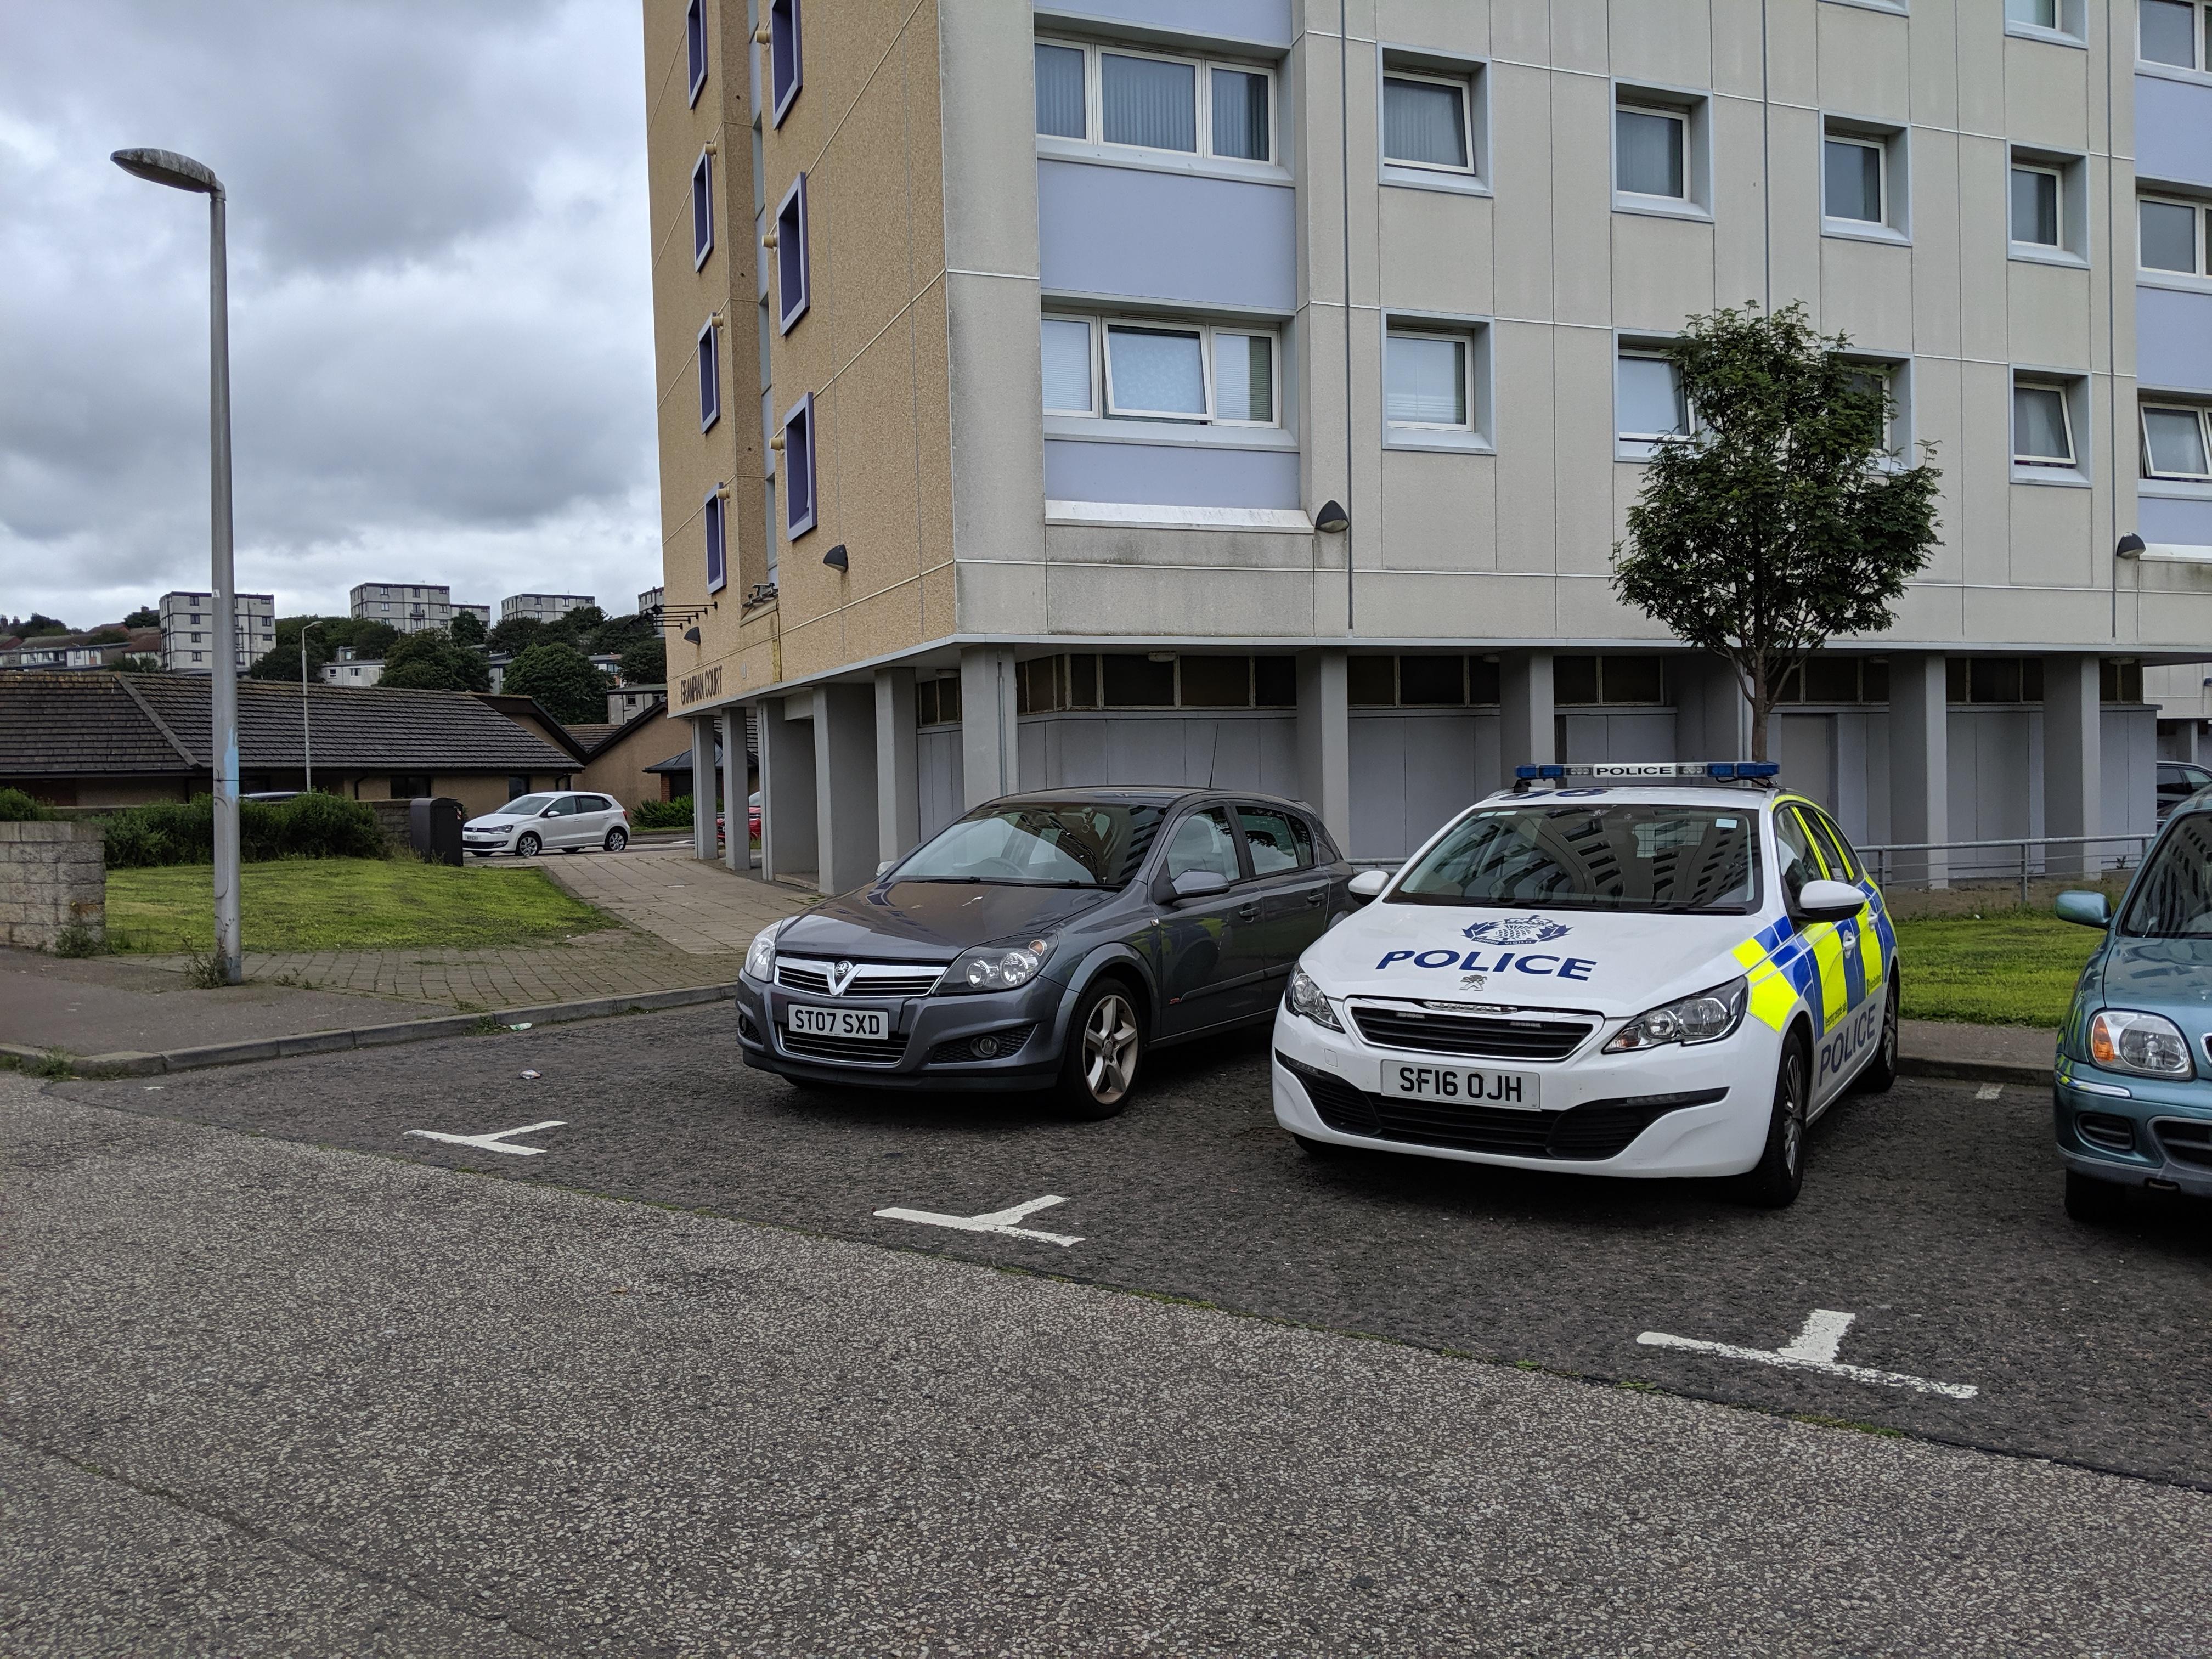 Police outside Grampian Court